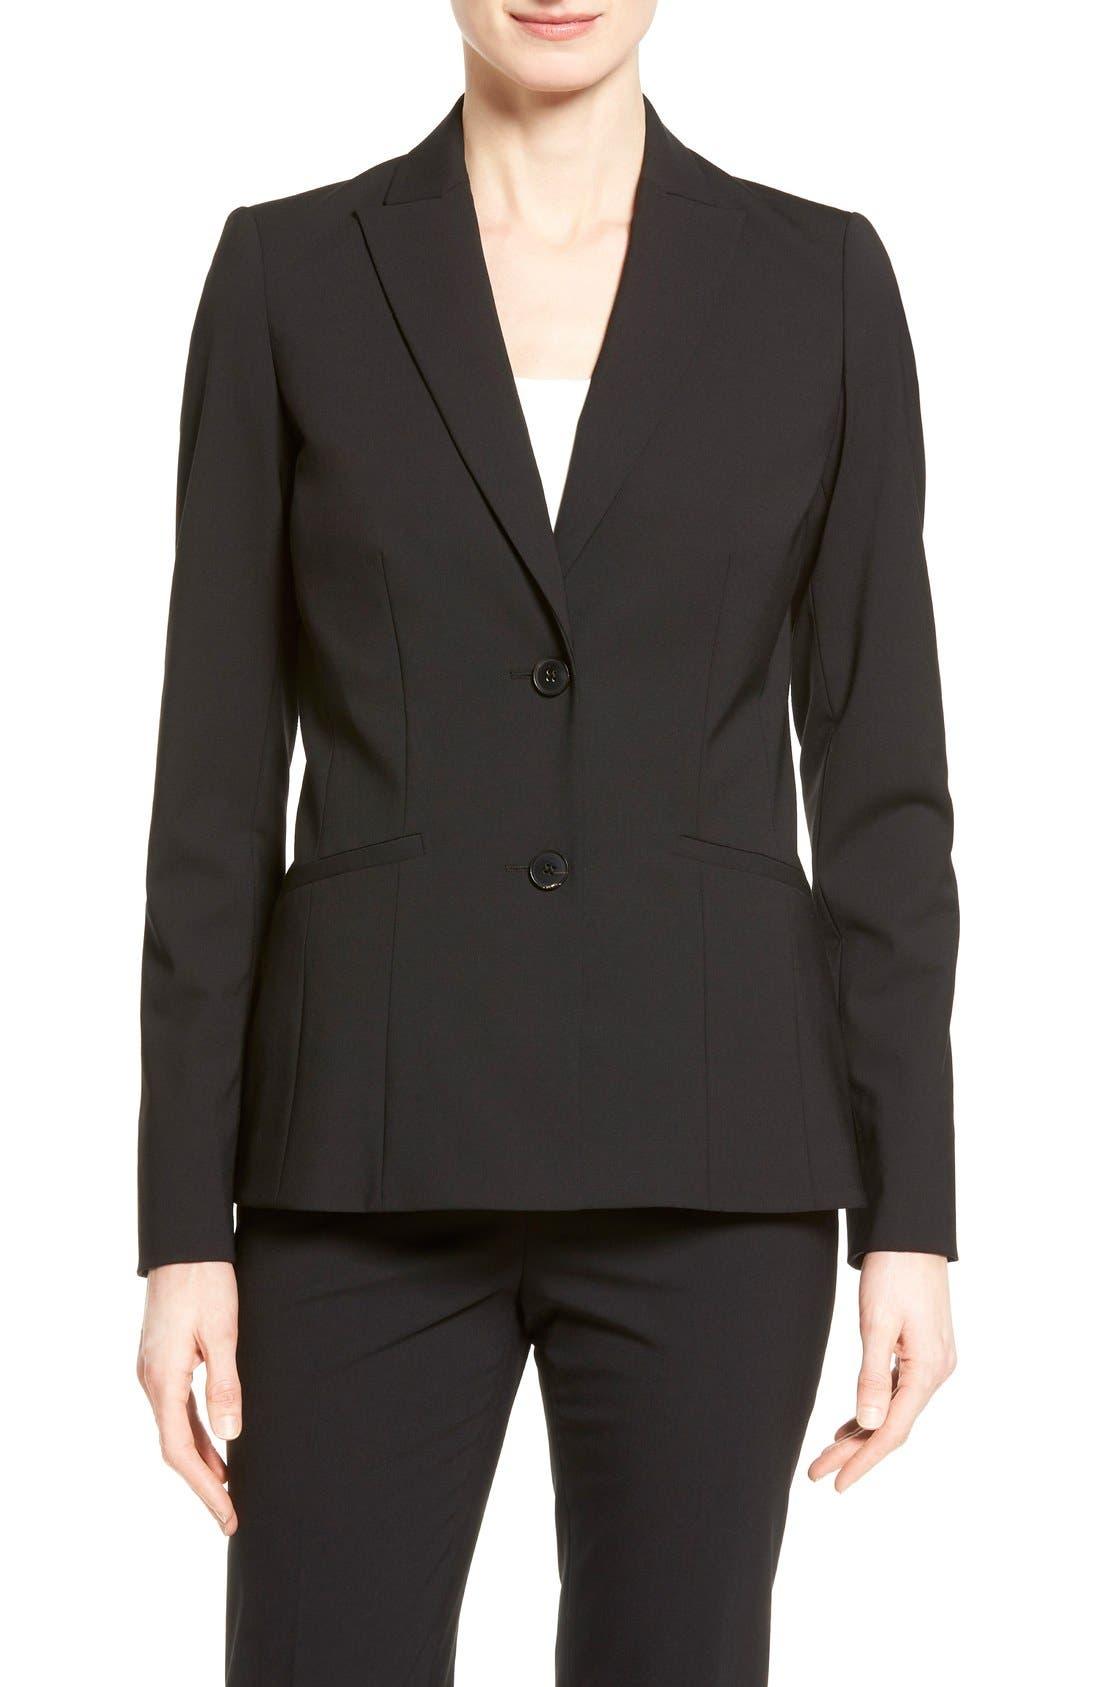 Lafayette 148 New York 'Rhonda' Stretch Wool Jacket